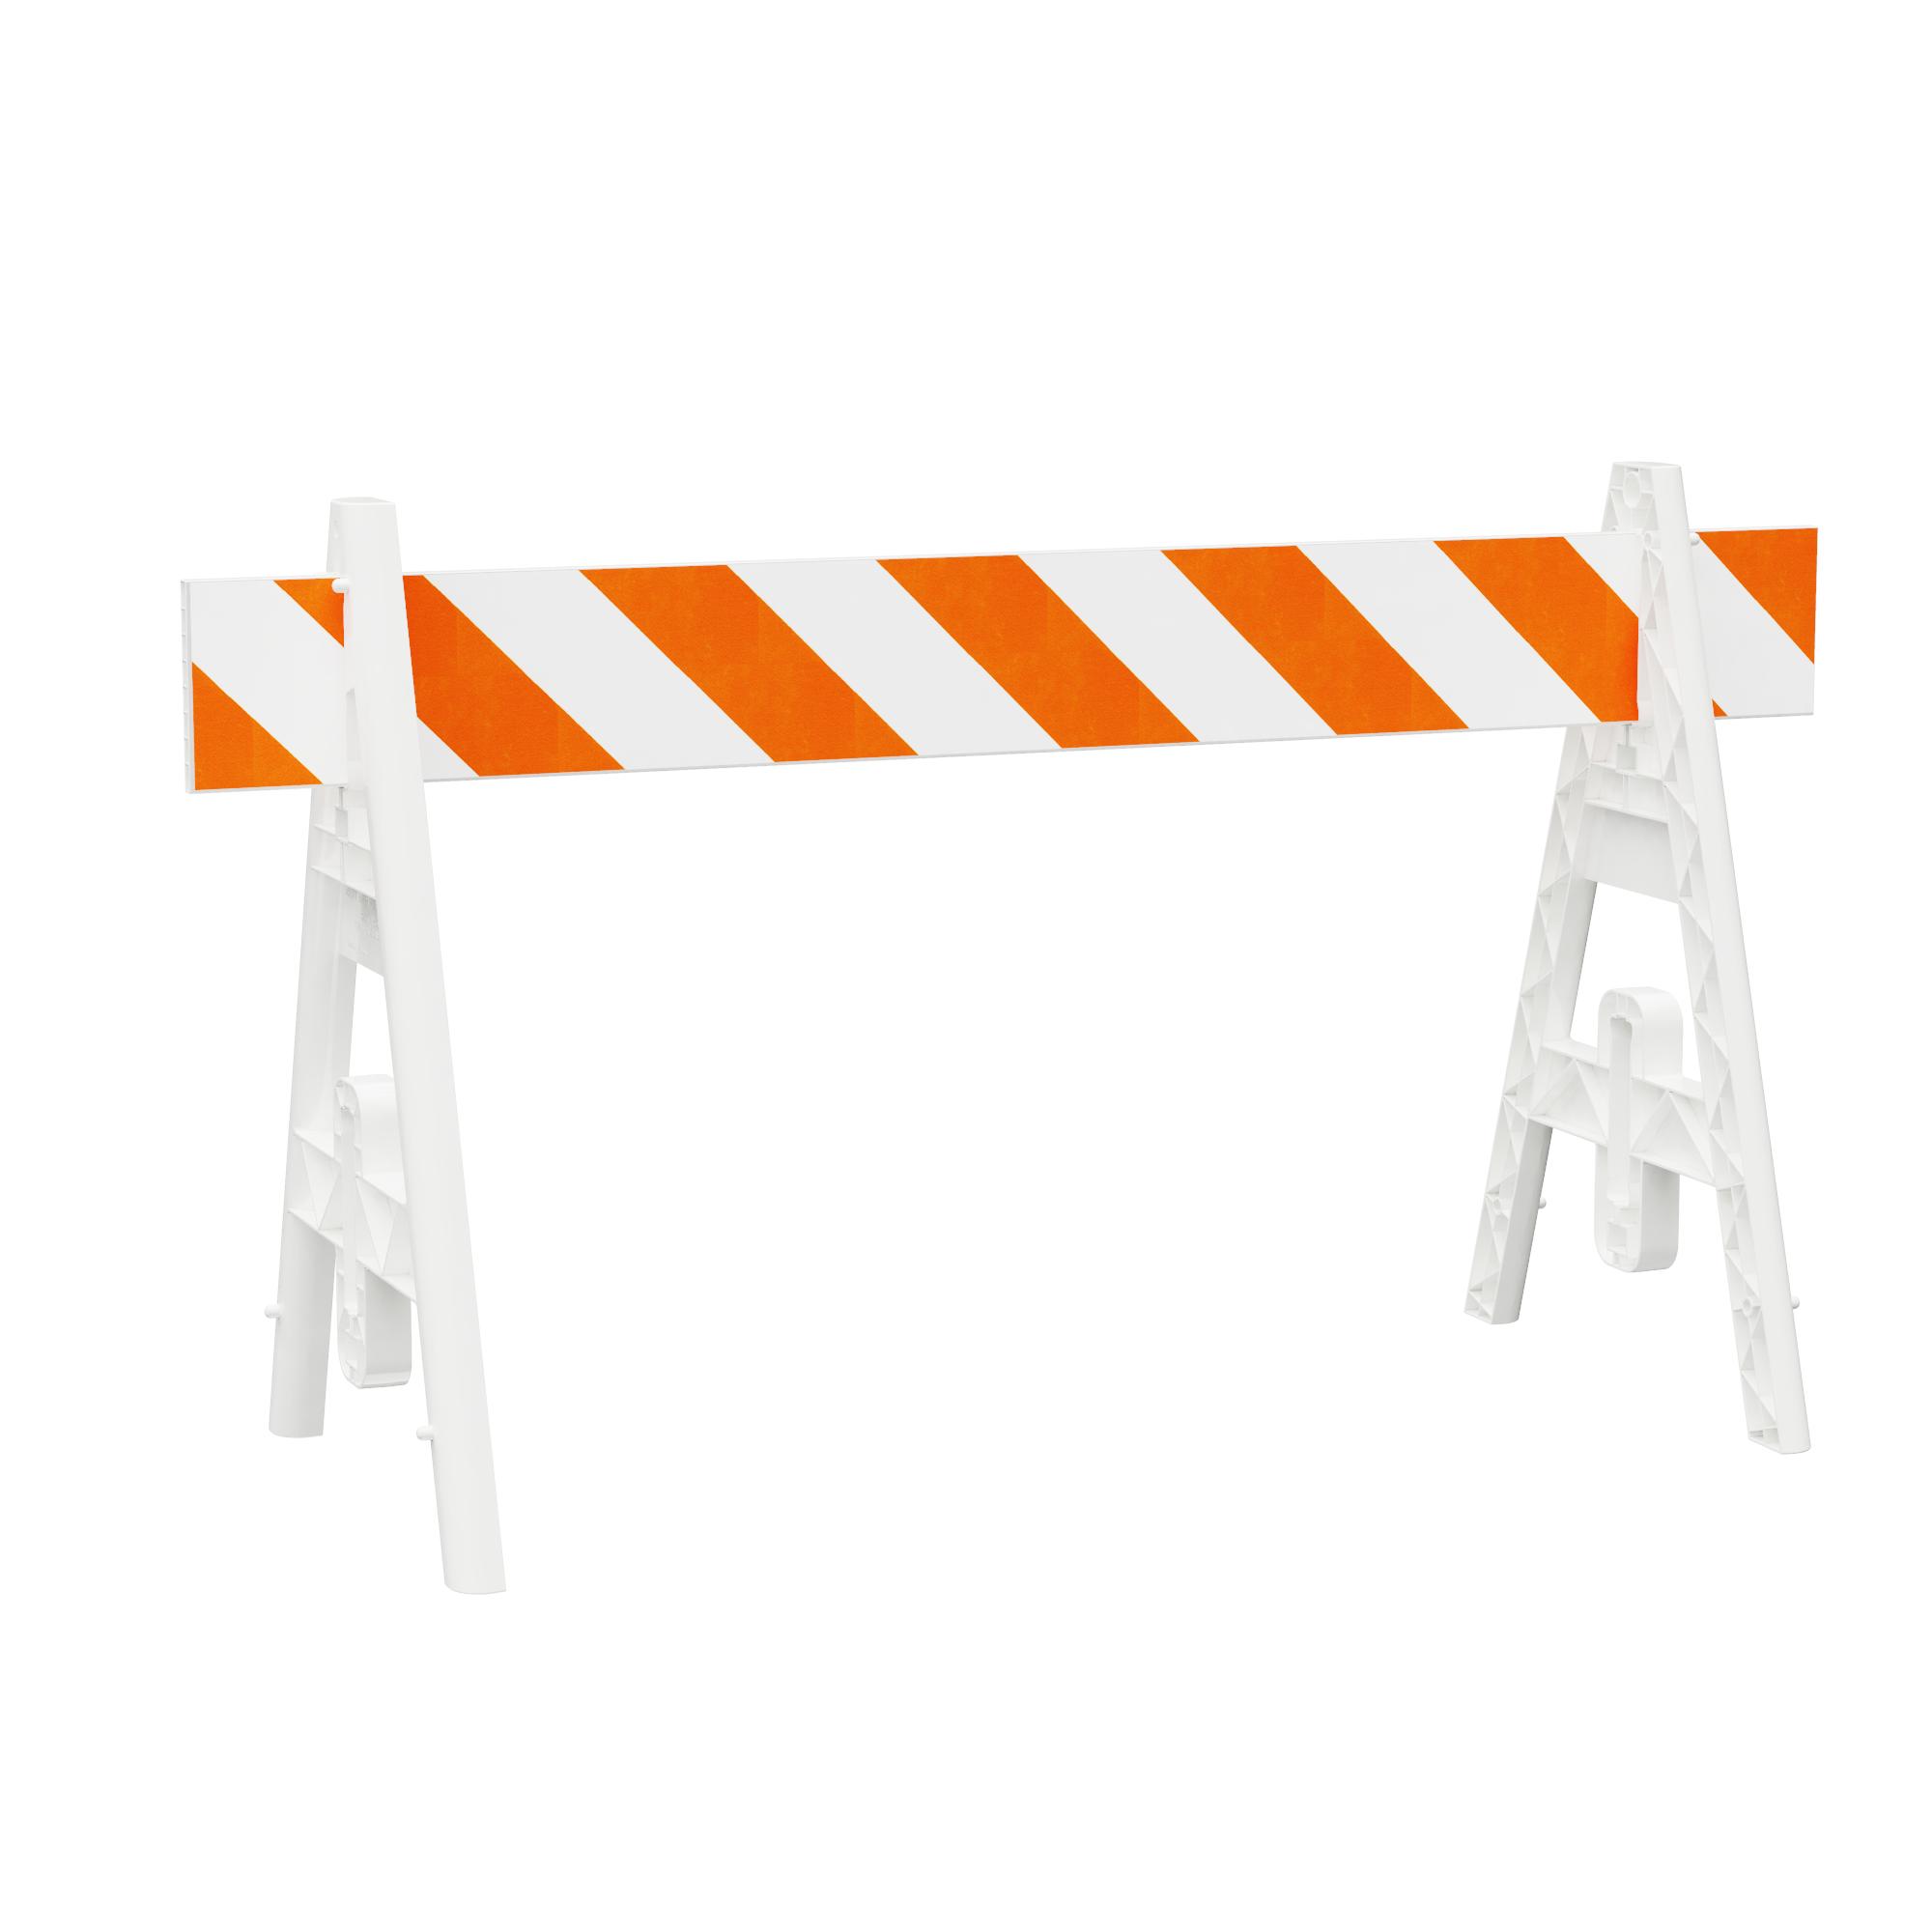 Omni A-Frame Road Barricade from Plasticade